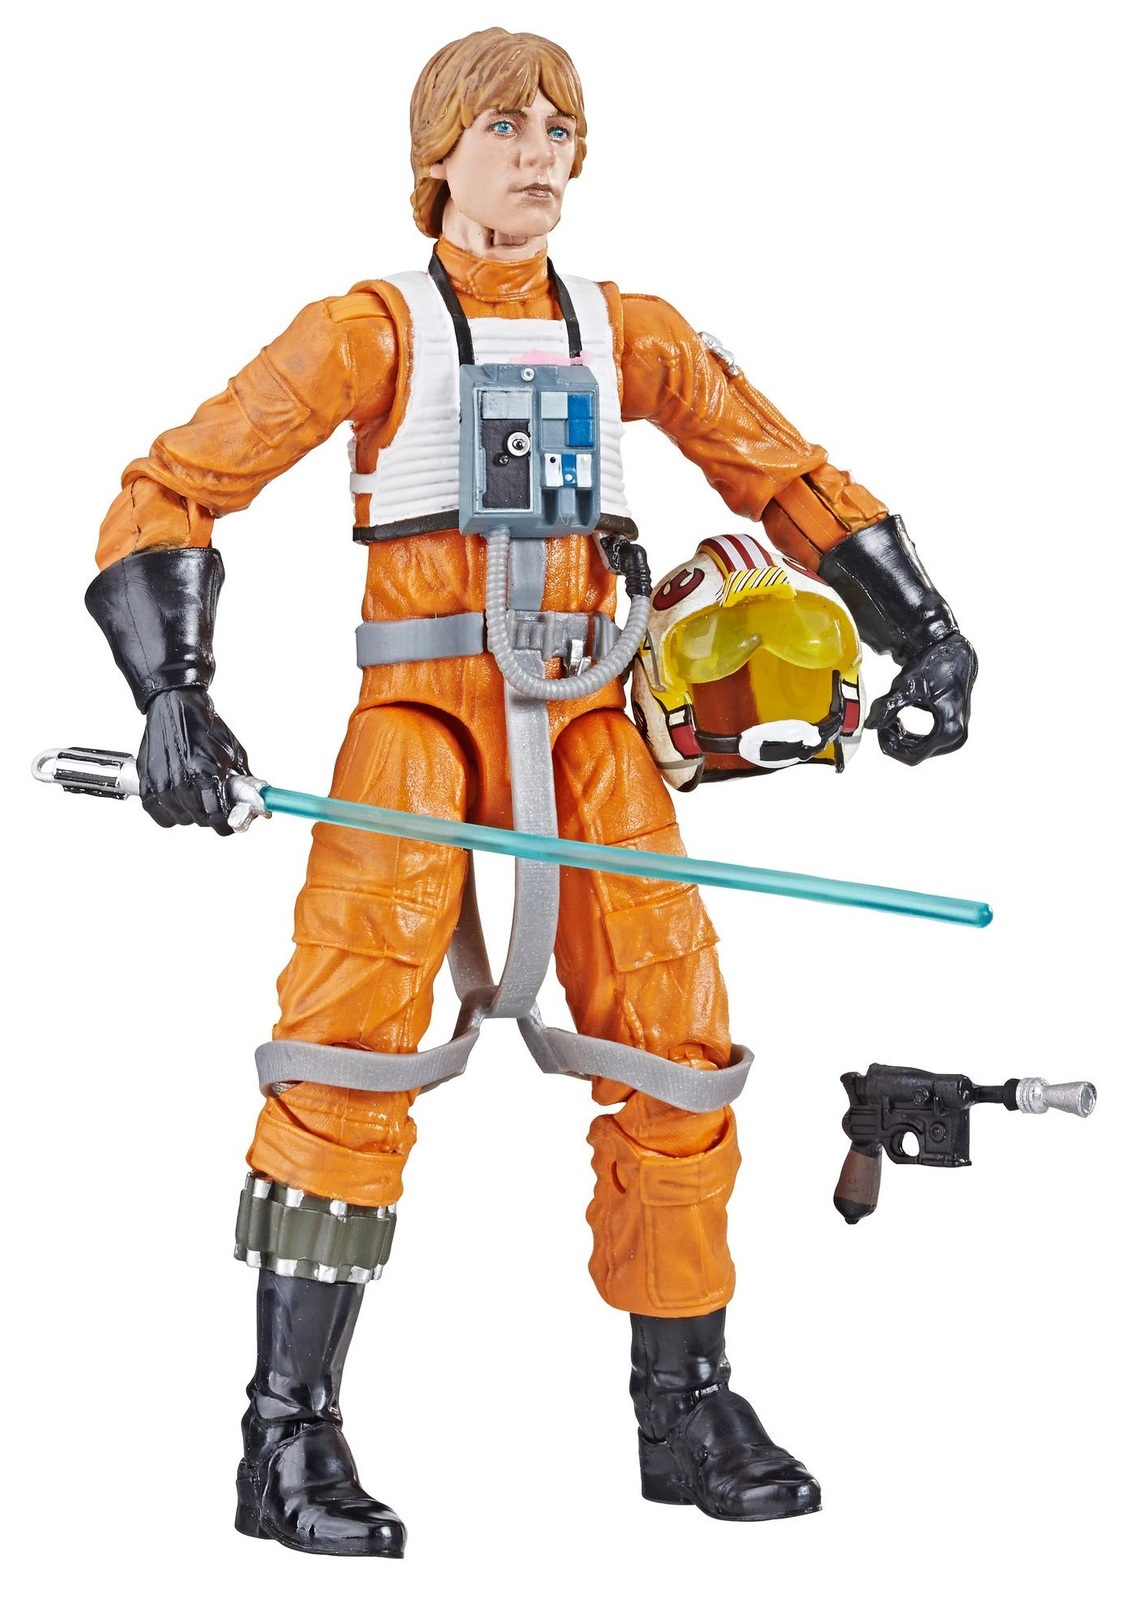 Star Wars: The Black Series Archive: Luke Skywalker - Action Figure image